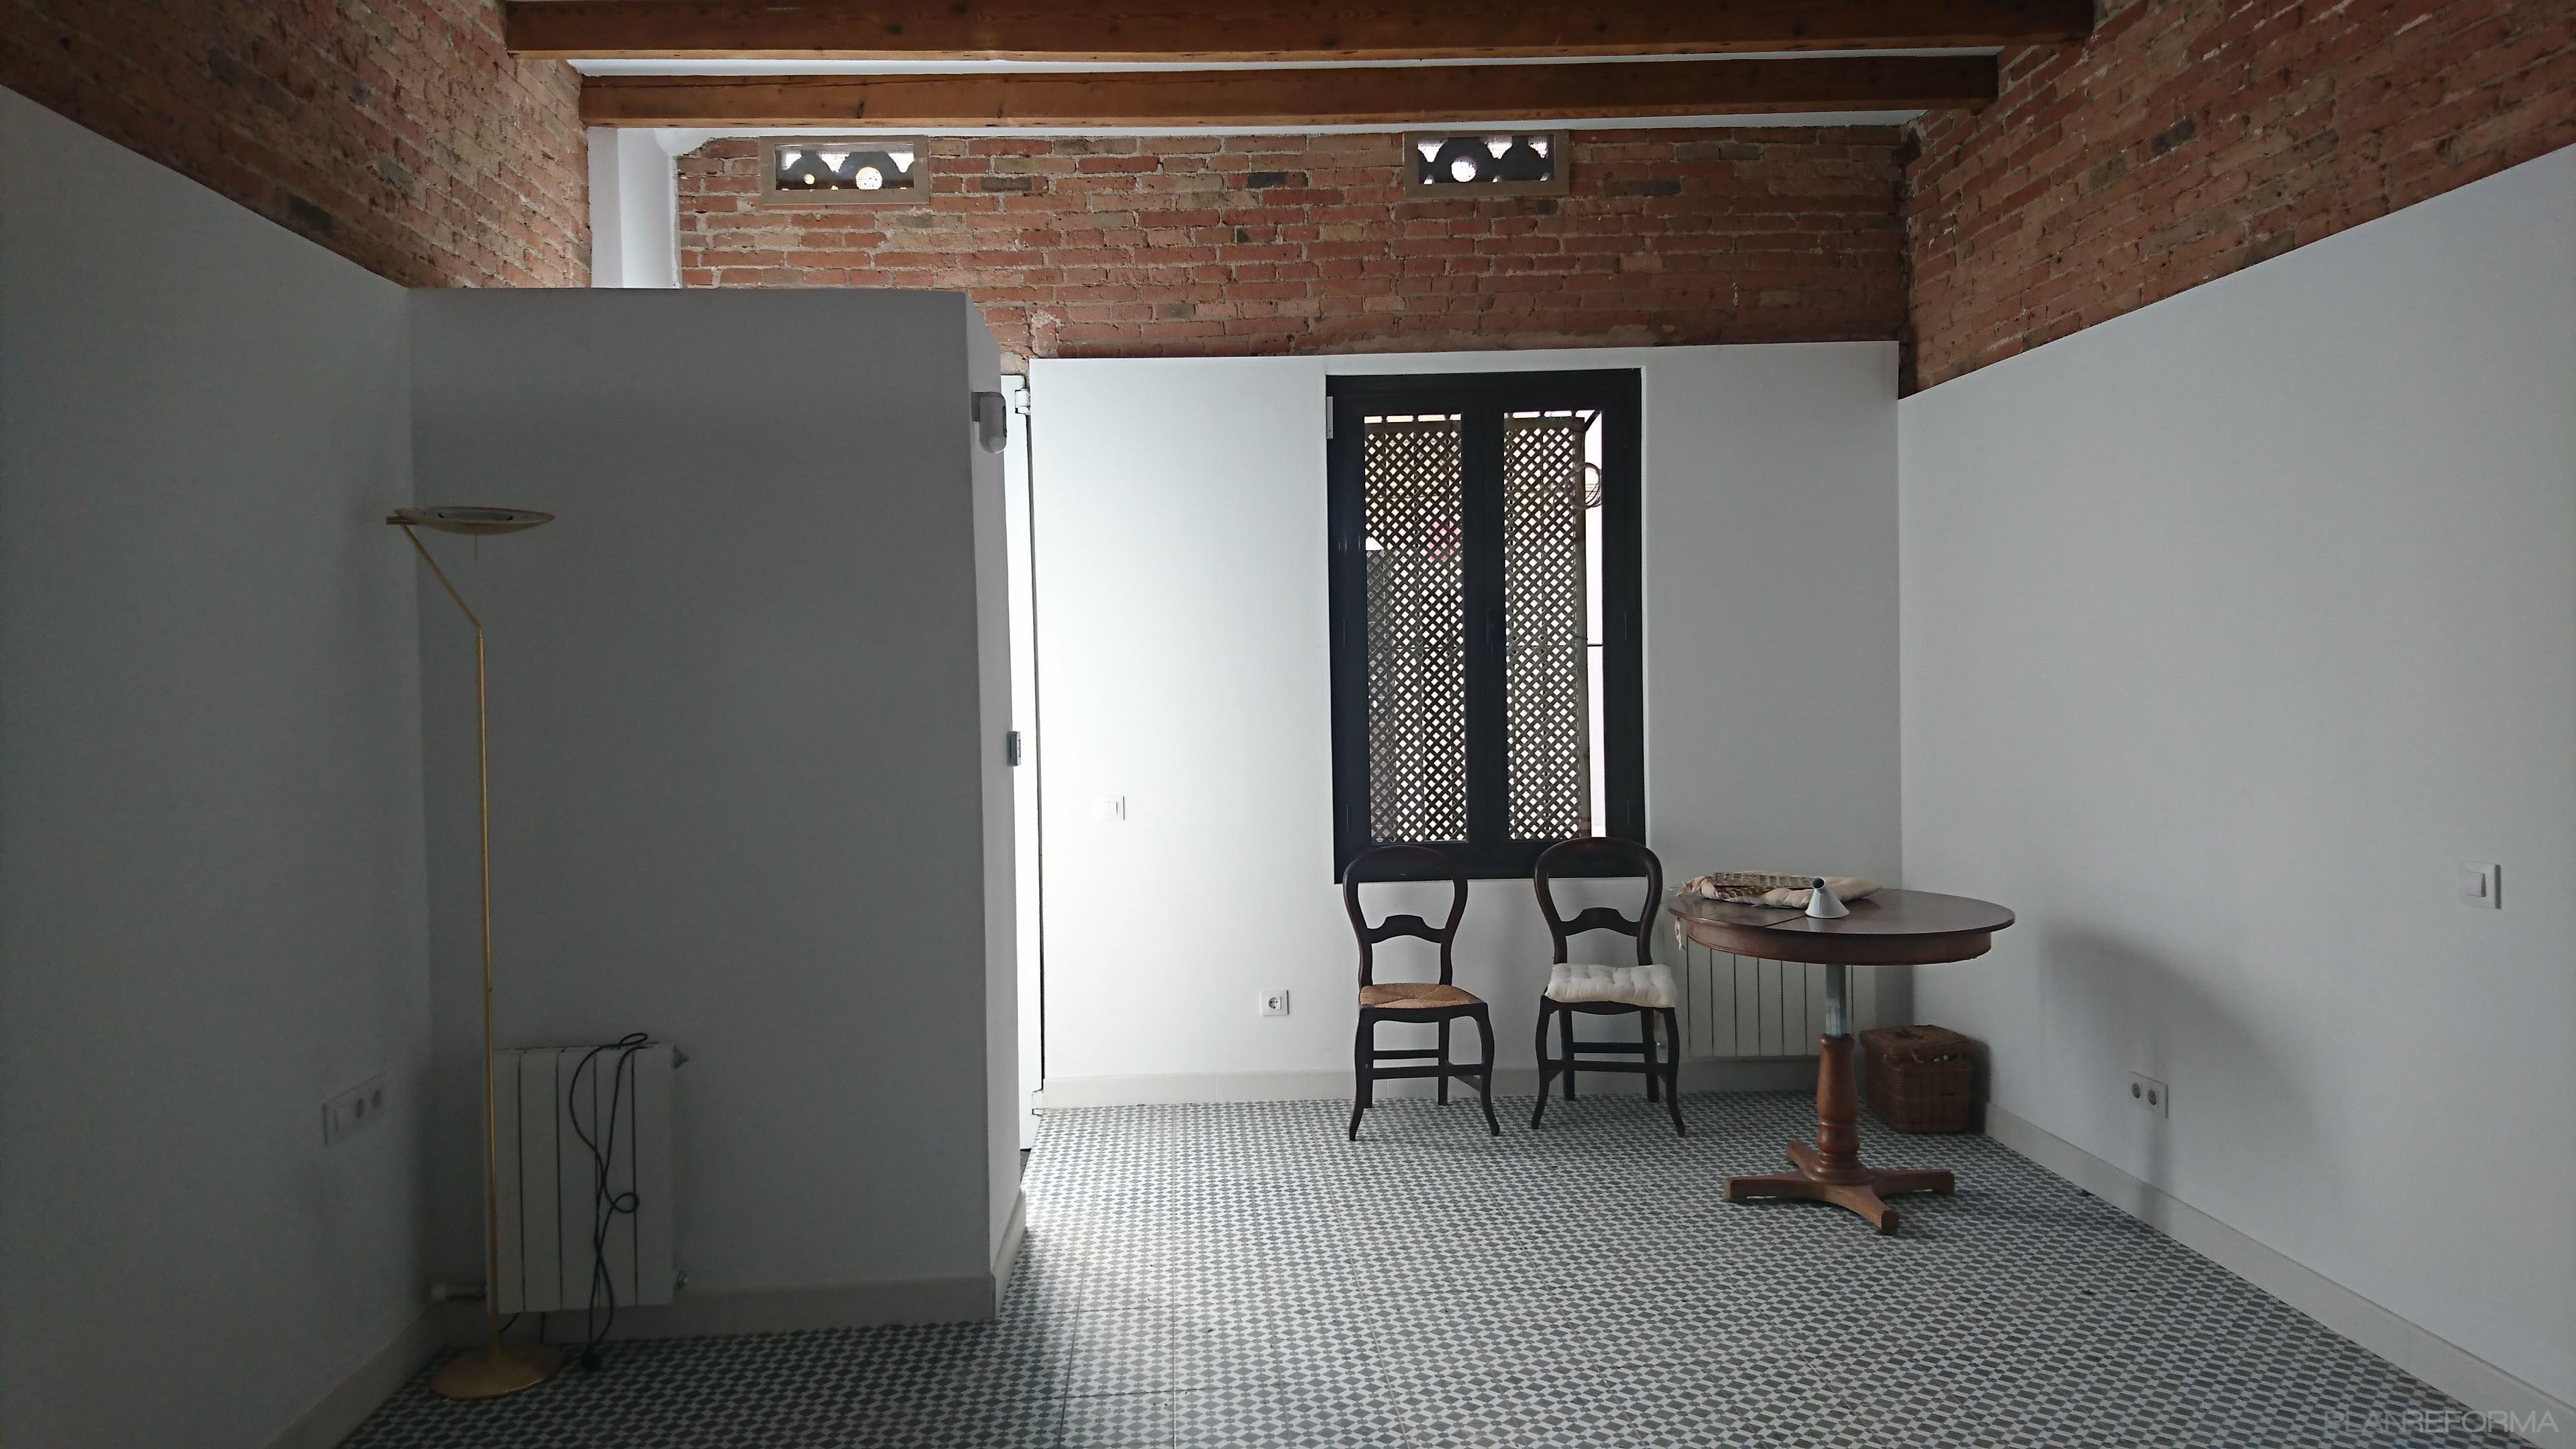 Comedor, Salon, Exterior Estilo mediterraneo Color gris, plateado  diseñado por Mar Batuecas   Arquitecto Técnico   Copyright Mar Batuecas